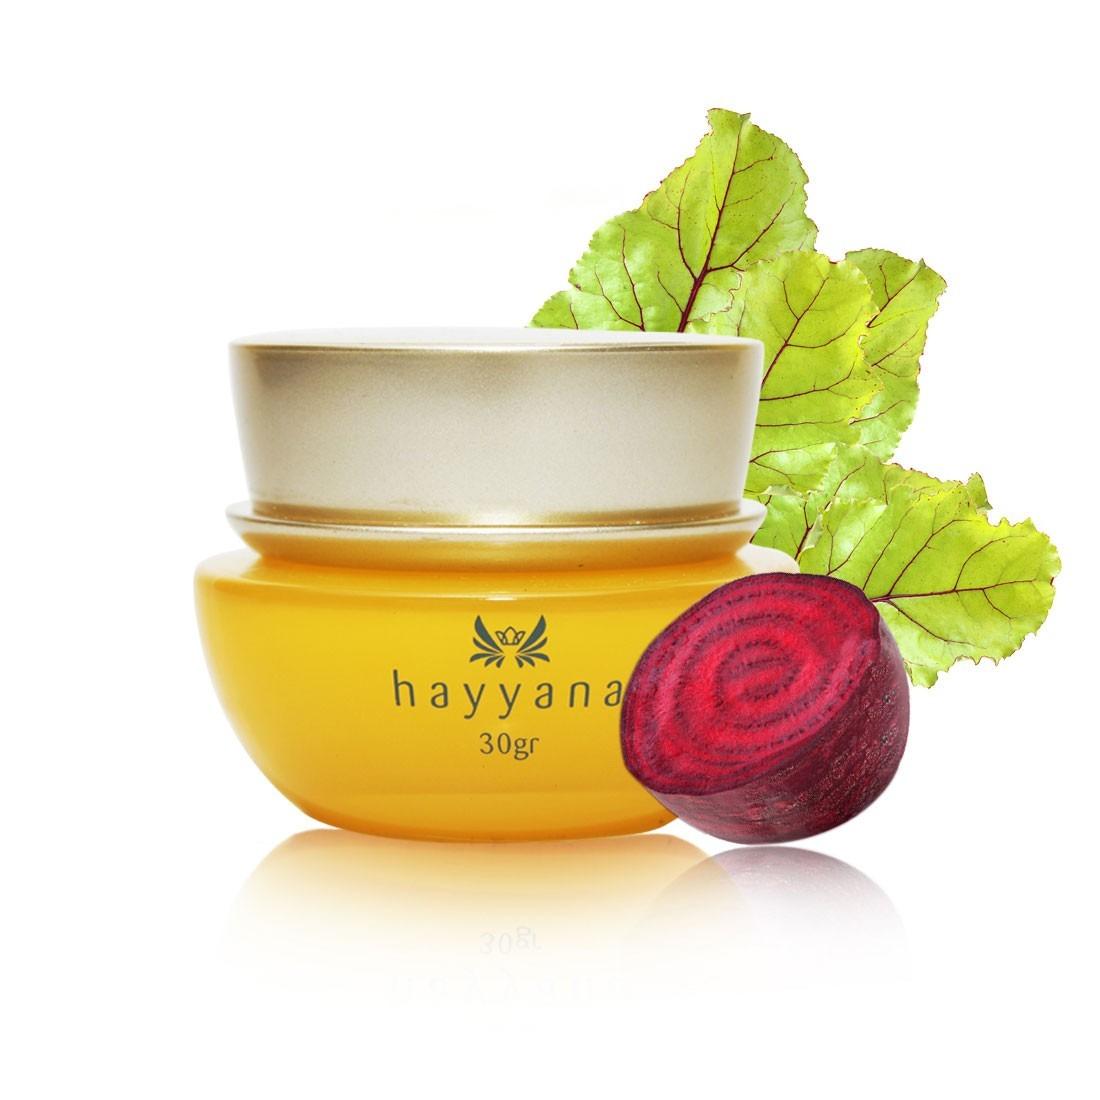 Hayyana  Royal Golden Cocoon Hydroprotection Cream